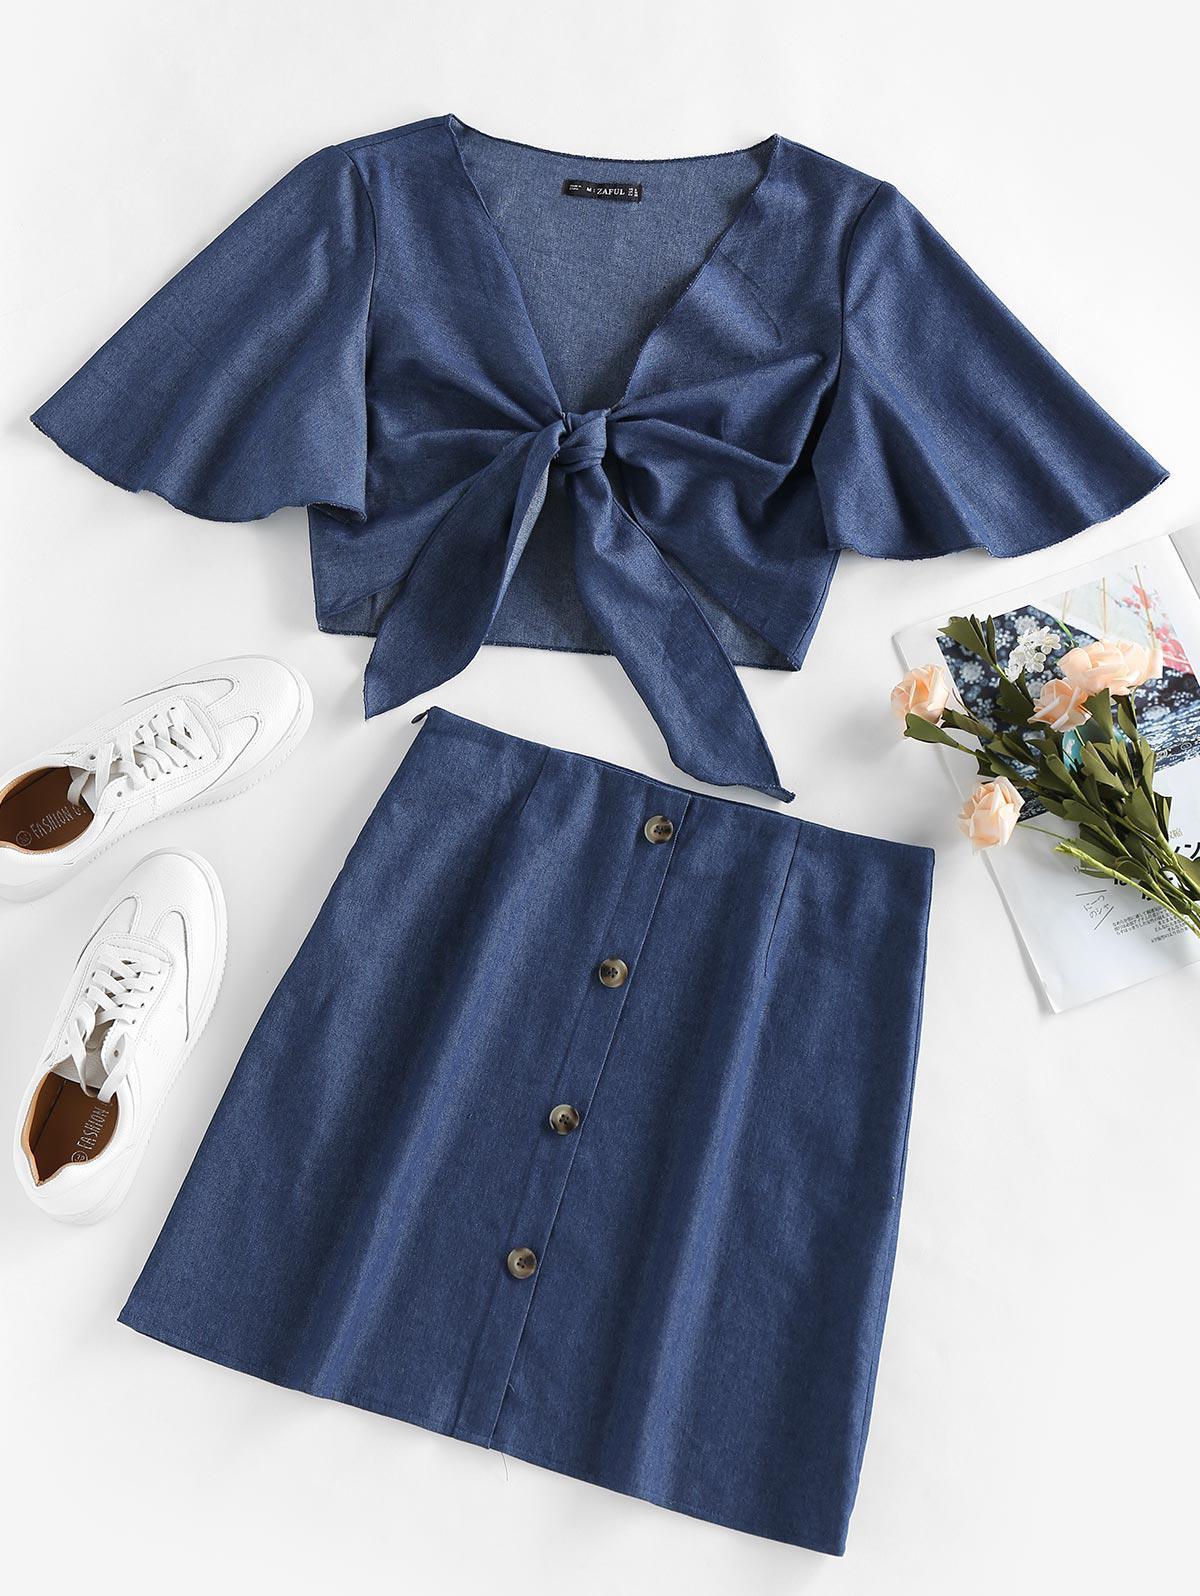 ZAFUL Chambray Tie Front Flutter Sleeve Skirt Set